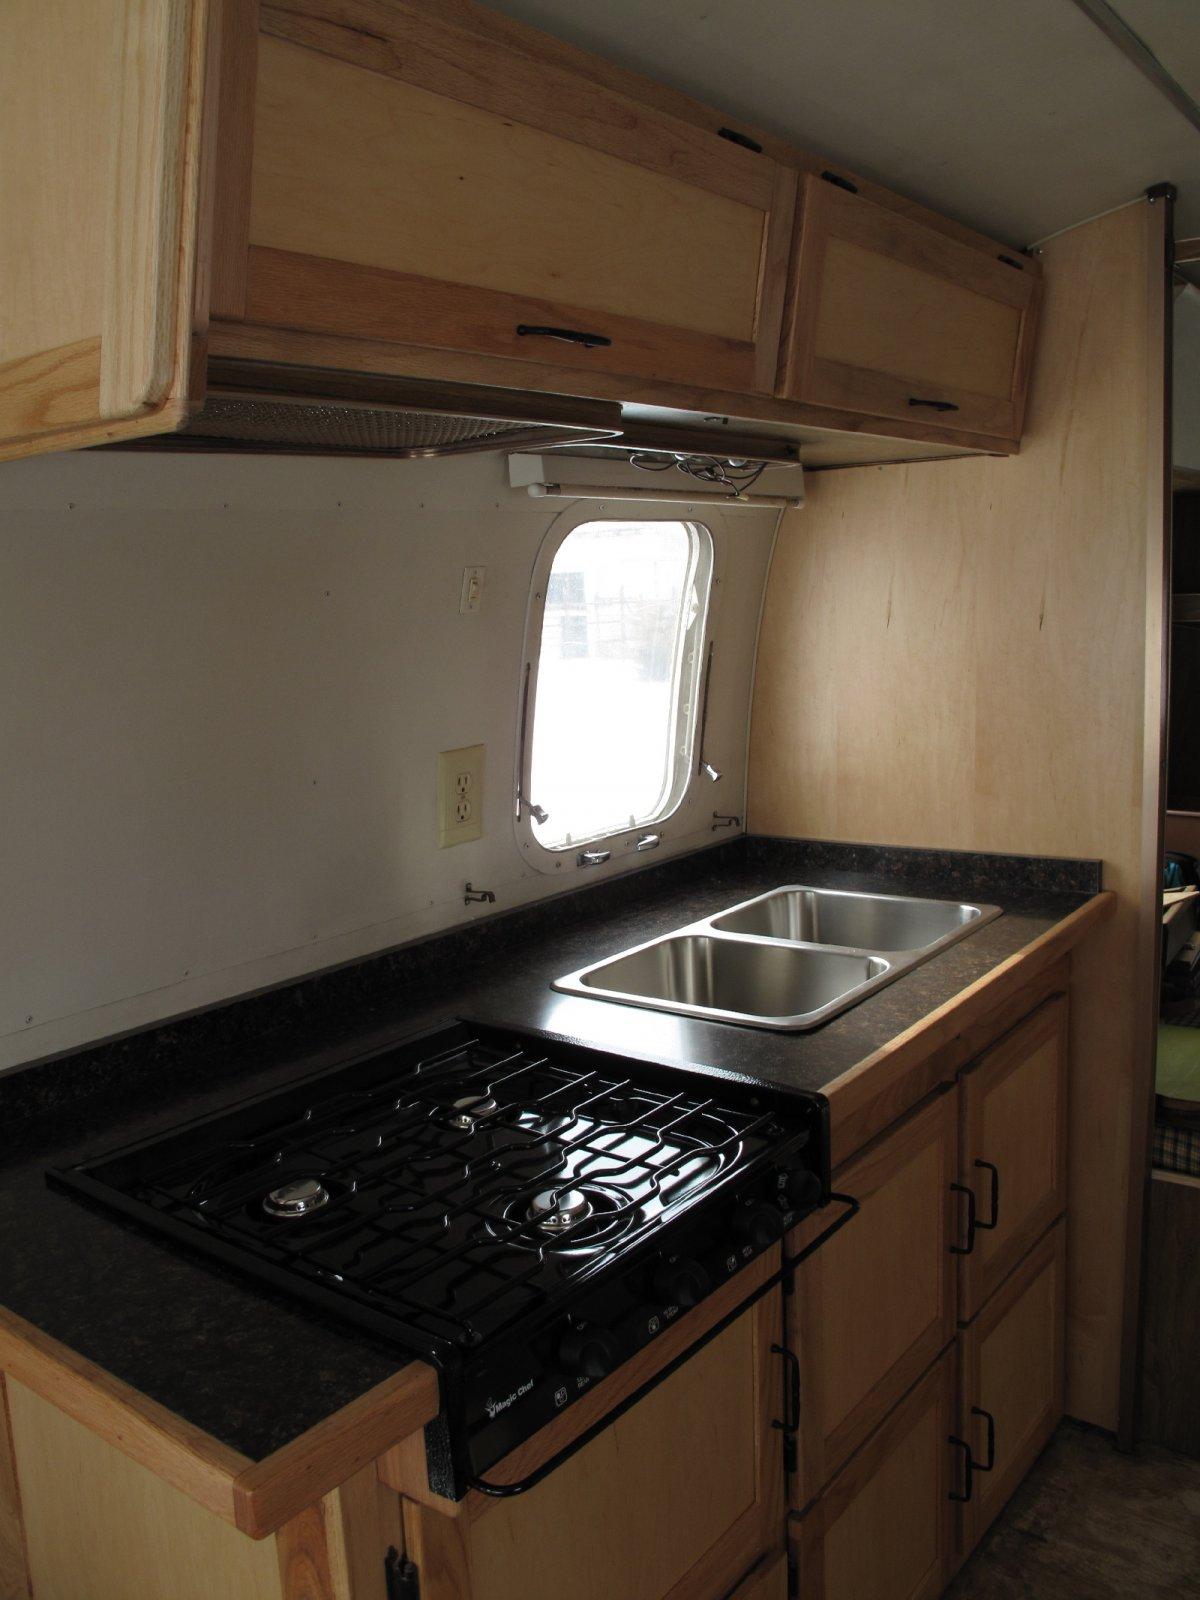 Click image for larger version  Name:Upper sink cabinet 2.jpg Views:84 Size:190.3 KB ID:95515